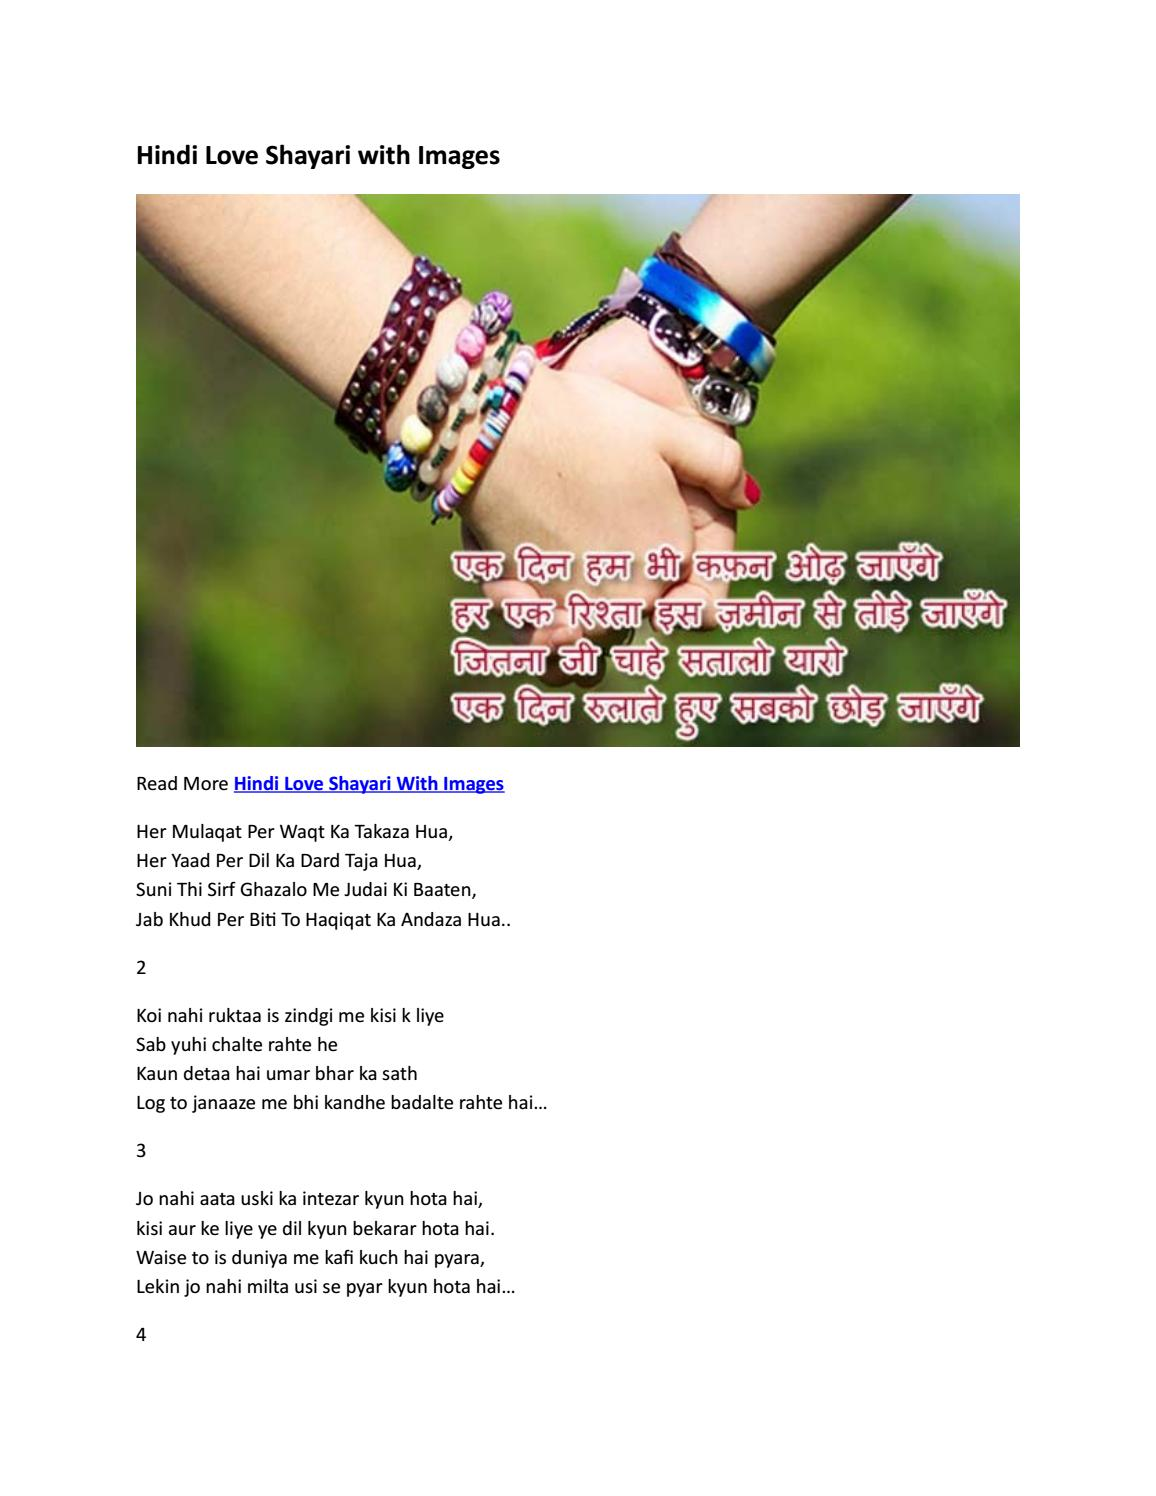 Hindi love shayari and romantic images by Aarushi Sharma - issuu